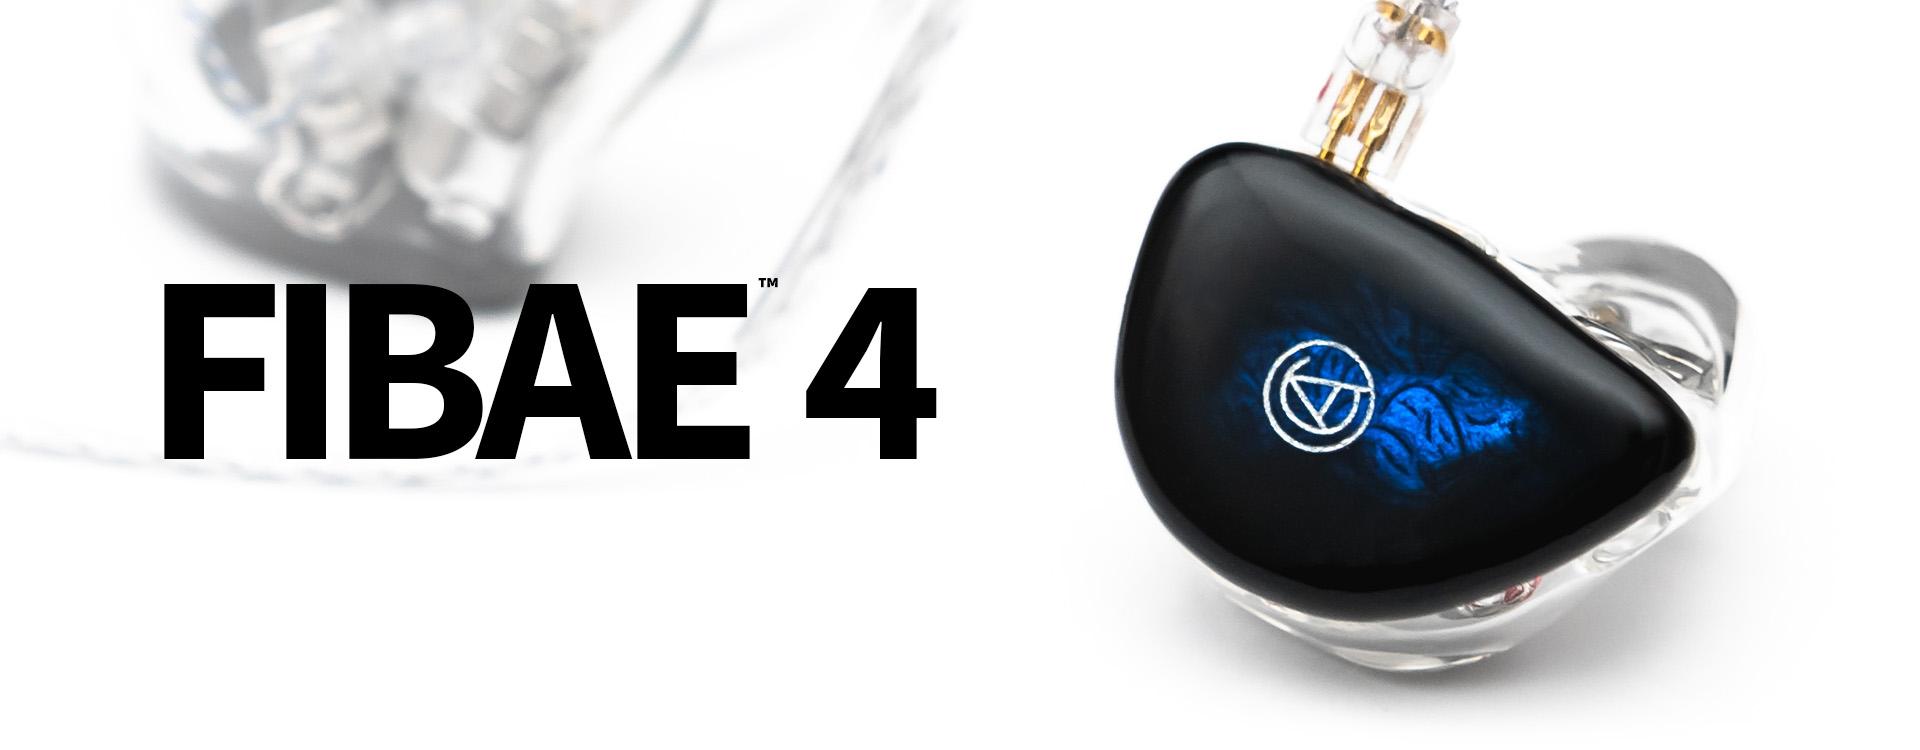 FIBAE 4 PREMIERE